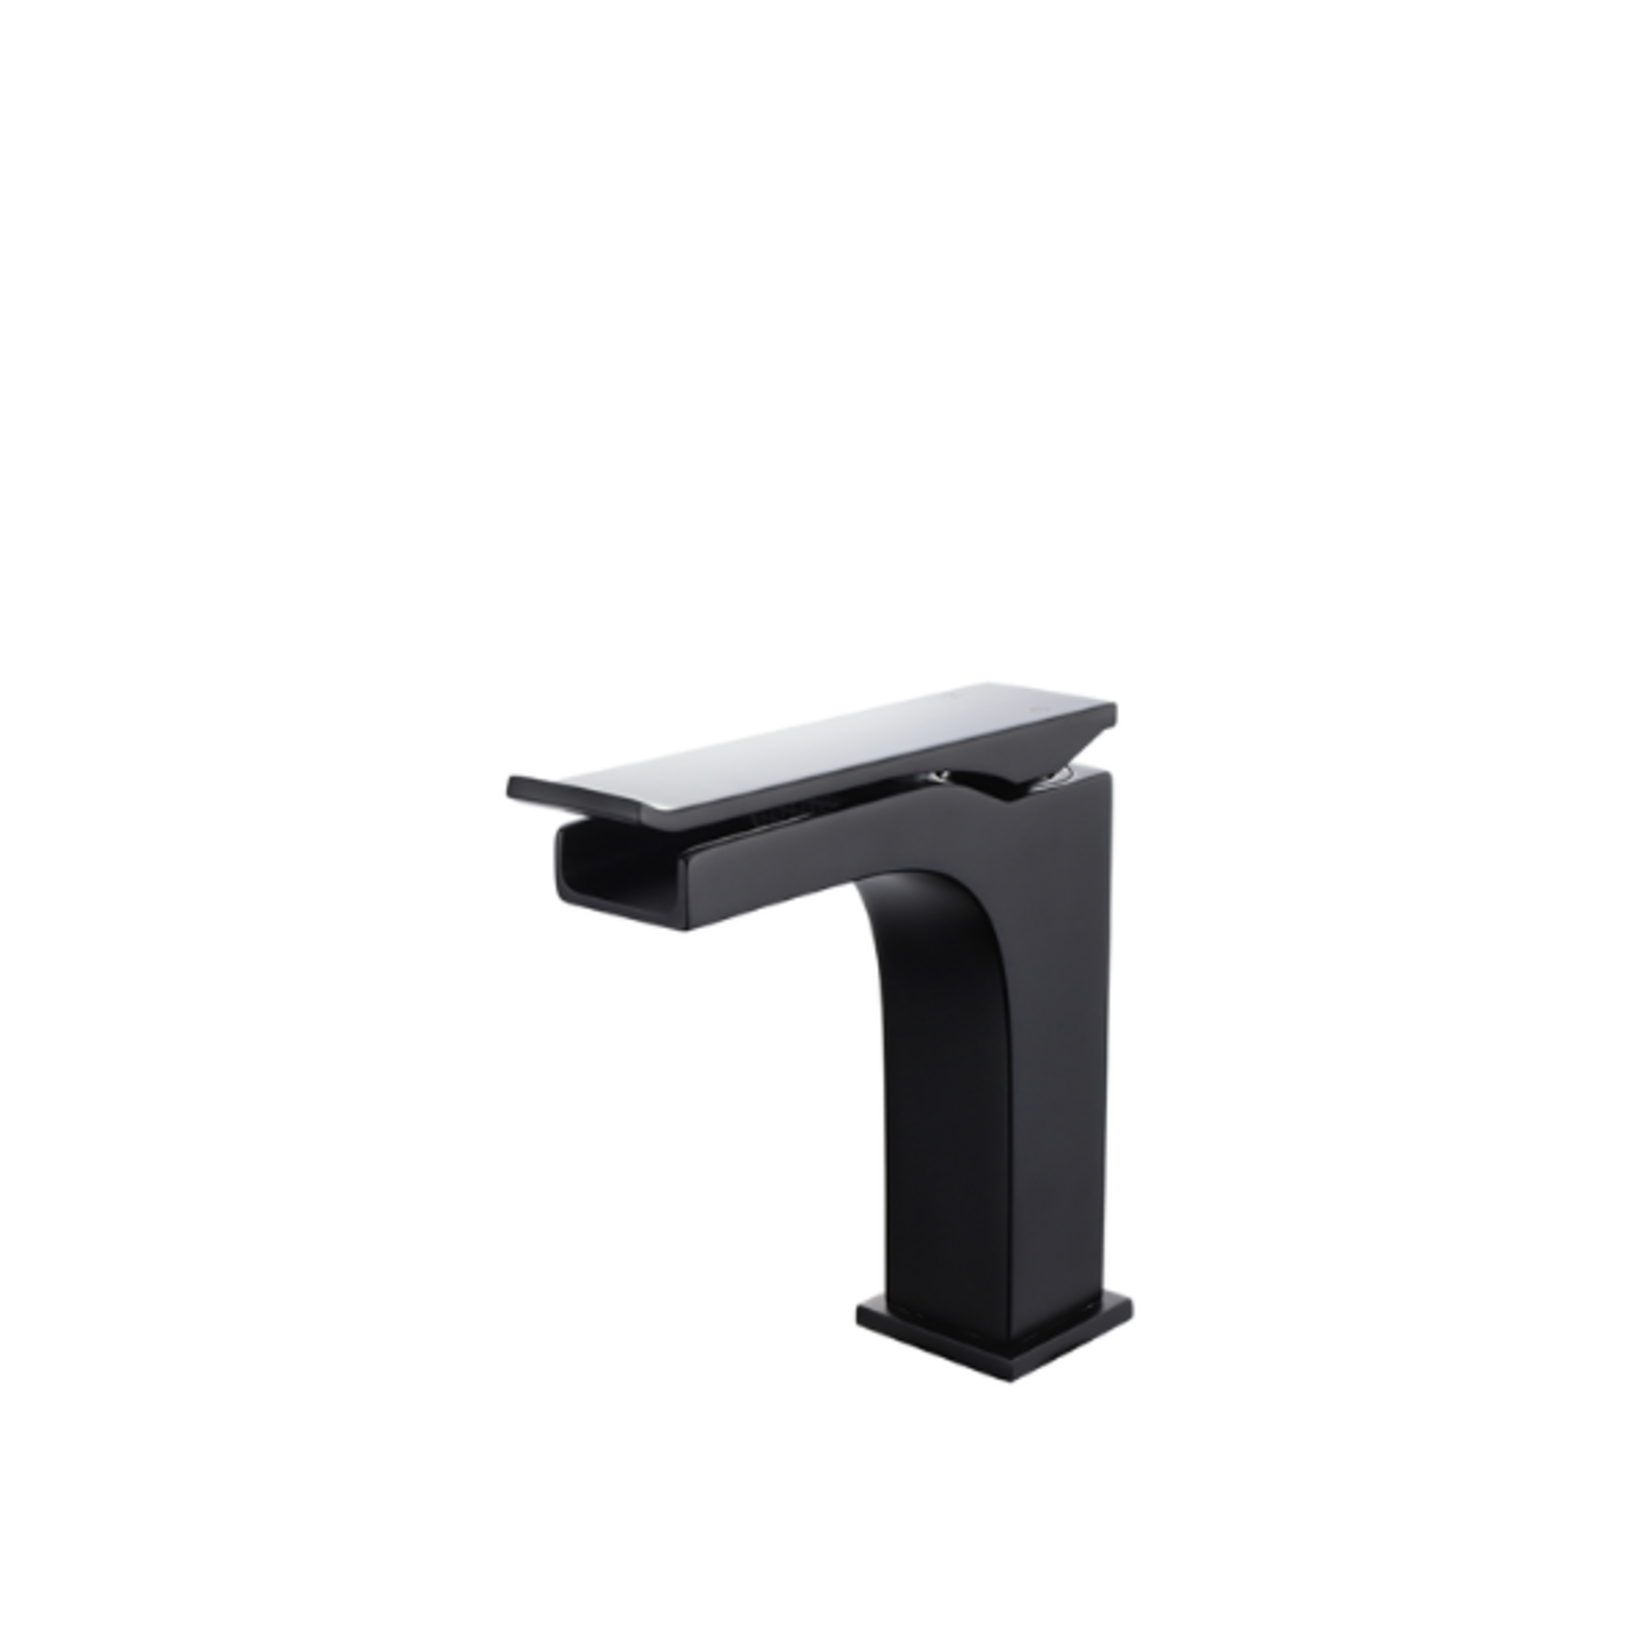 Robinet de lavabo noir mat NRD-981001-MB Nortrends